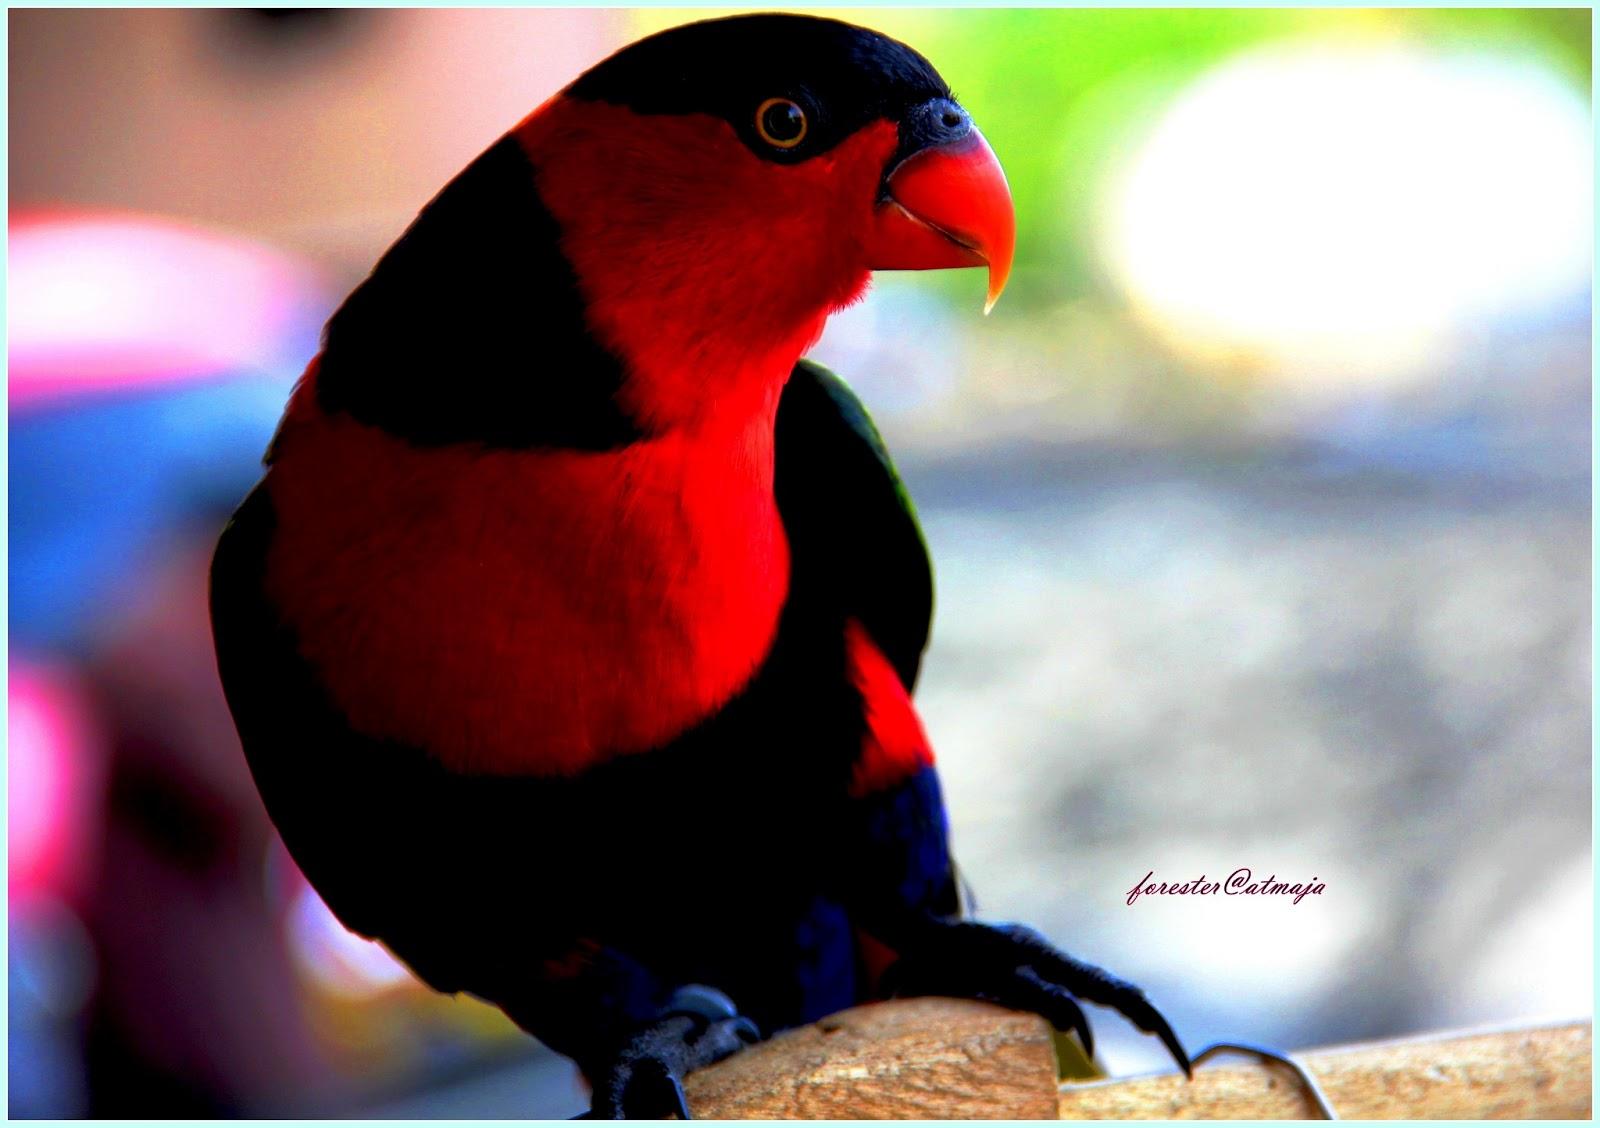 ... ekornya juga berwarna kuning burung betina serupa dengan burung jantan